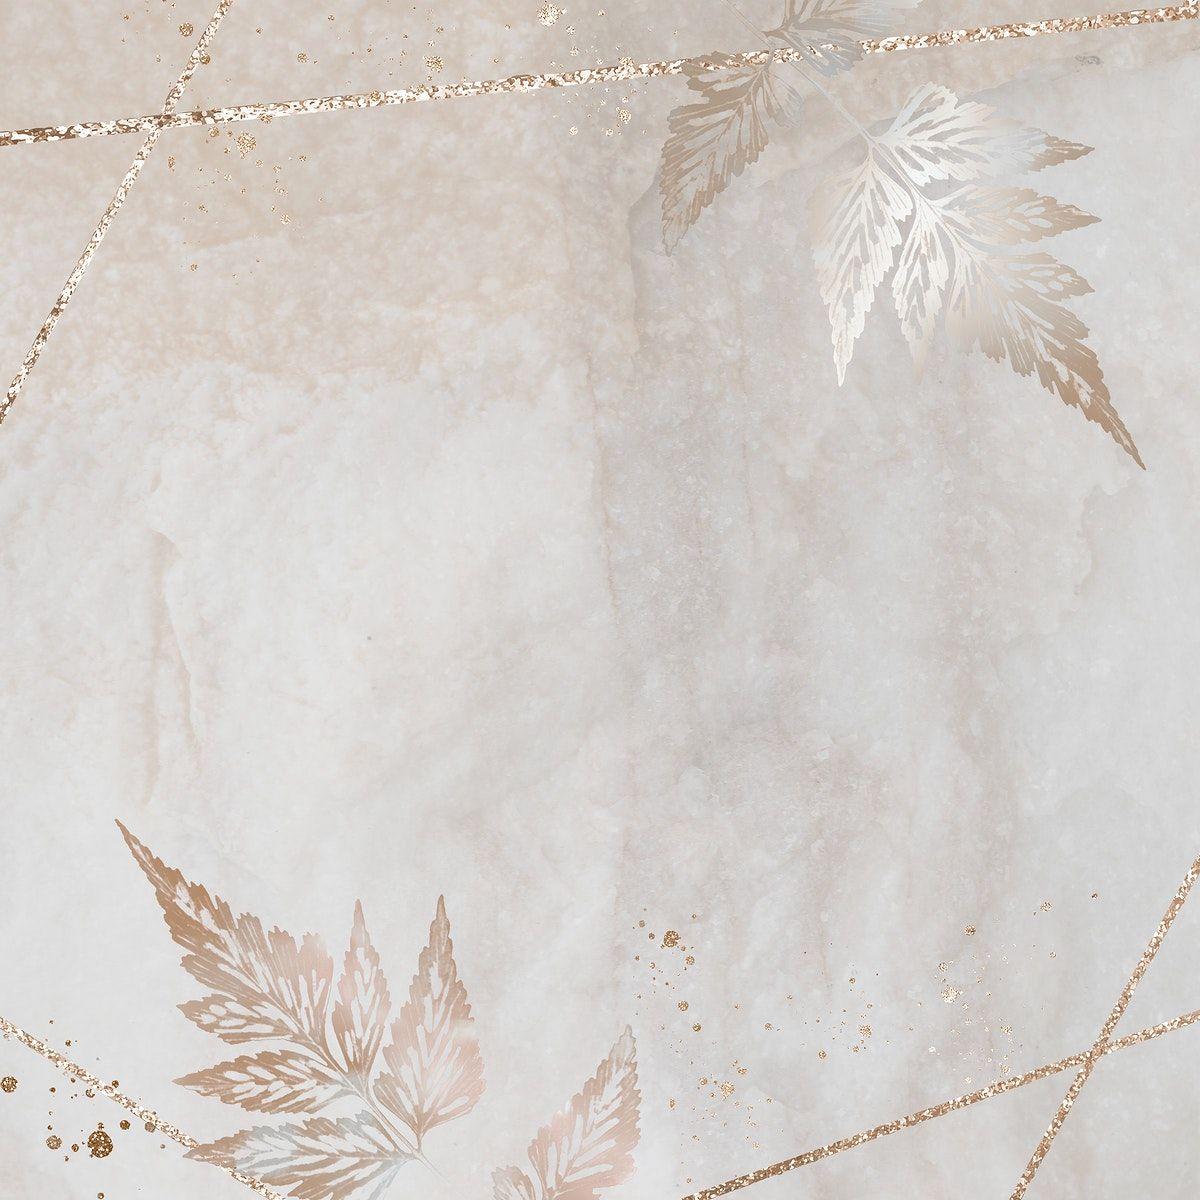 Download Premium Illustration Of Glittery Sickle Spleenwort Frame Design Frame Design Wedding Planner Logo Flower Illustration